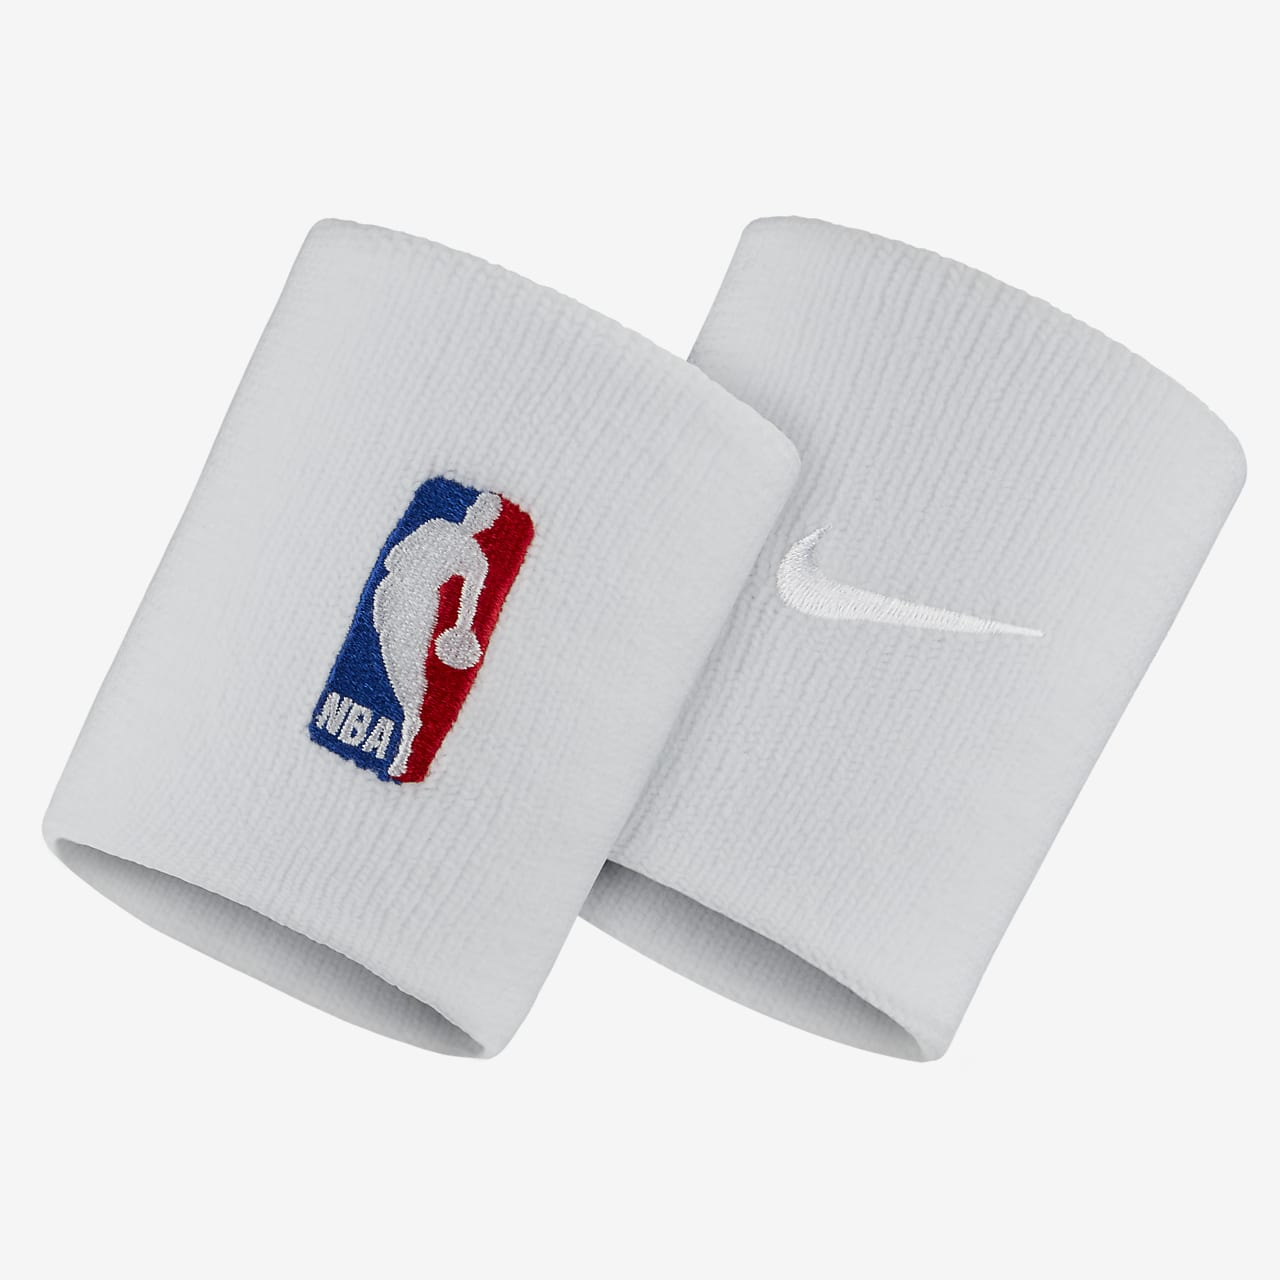 Nike NBA Elite Muñequeras de baloncesto